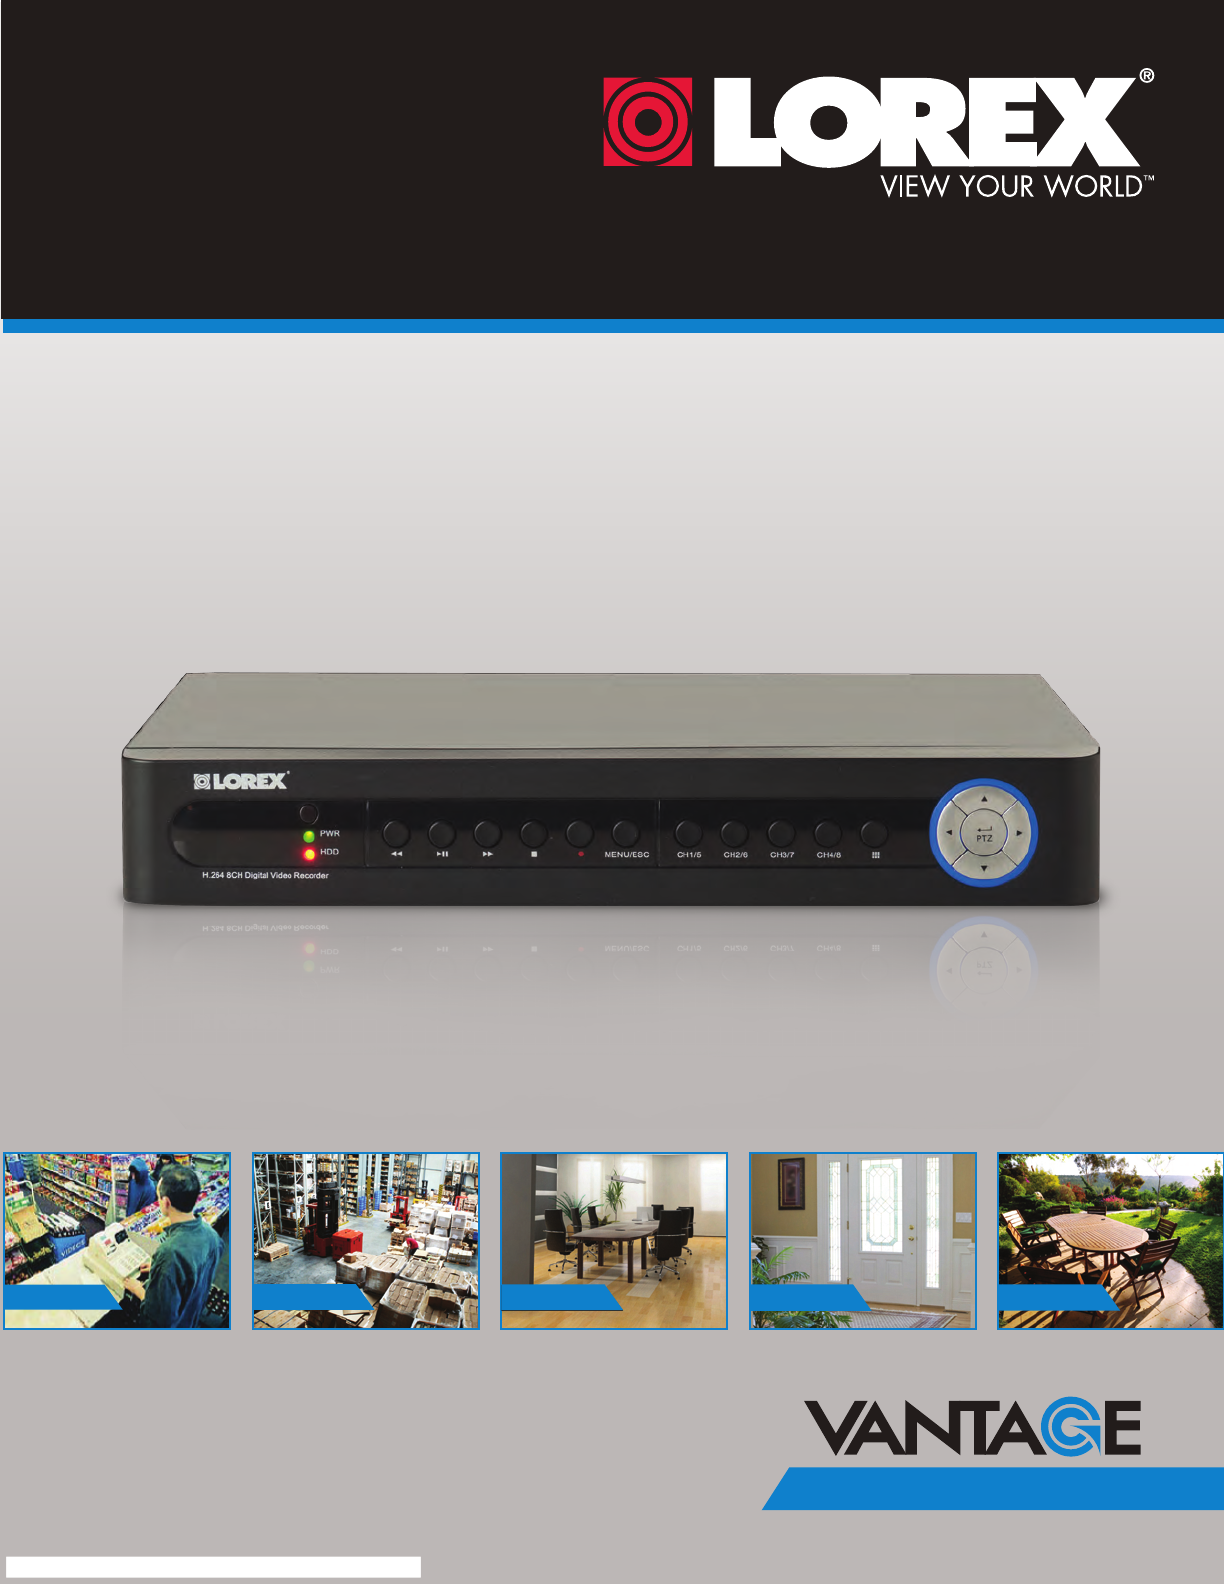 Lorex Vantage Lh110 Eco Series Instruction Manual ManualsLib Makes